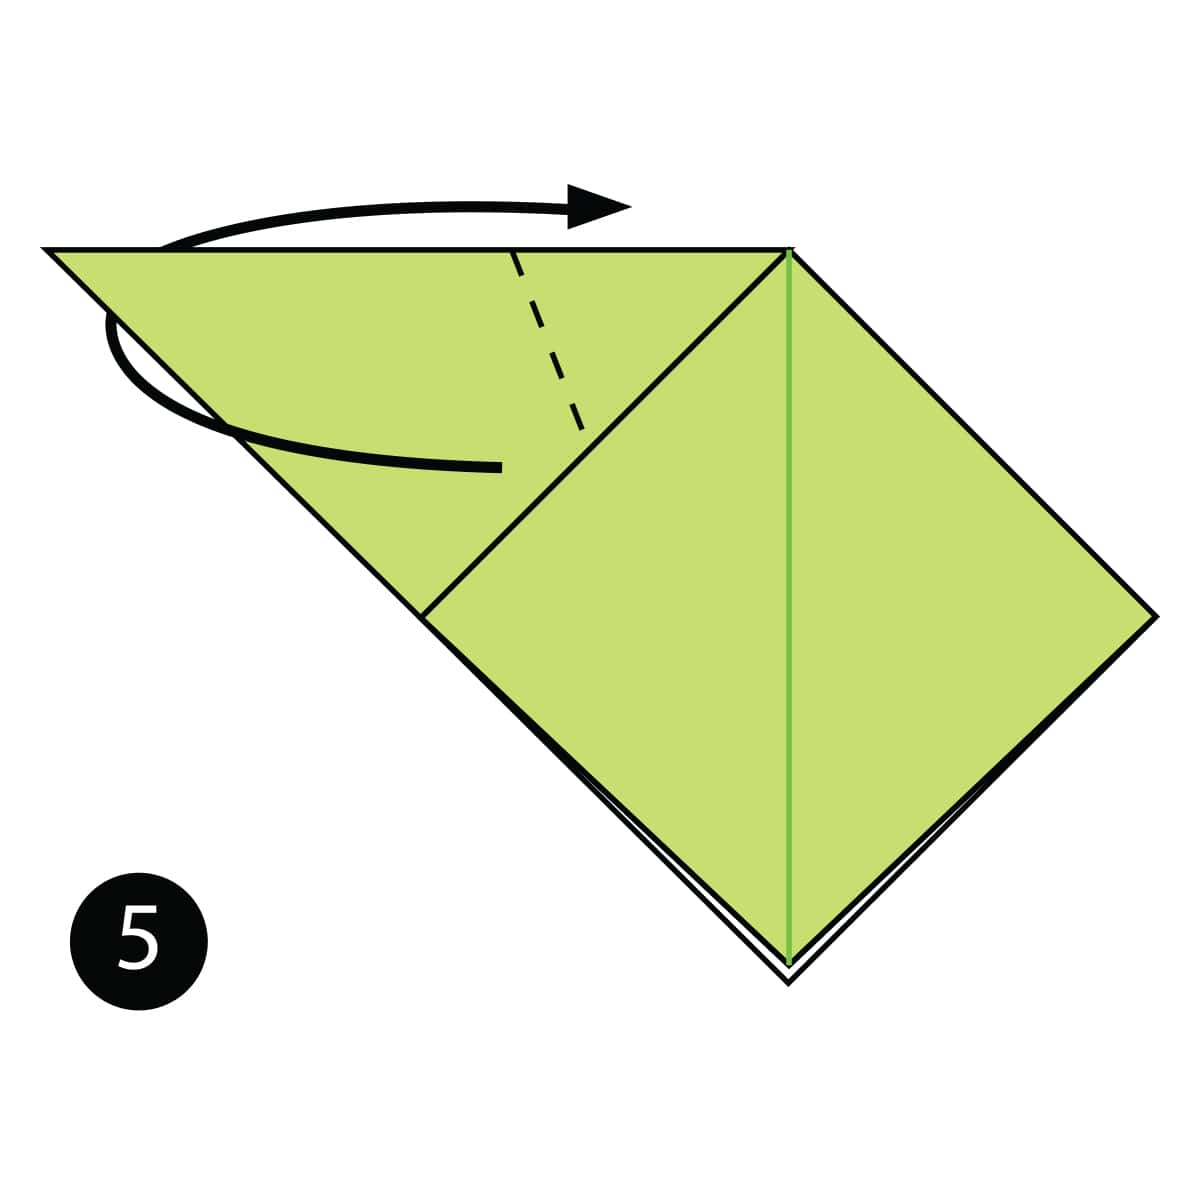 Tadpole Step 5